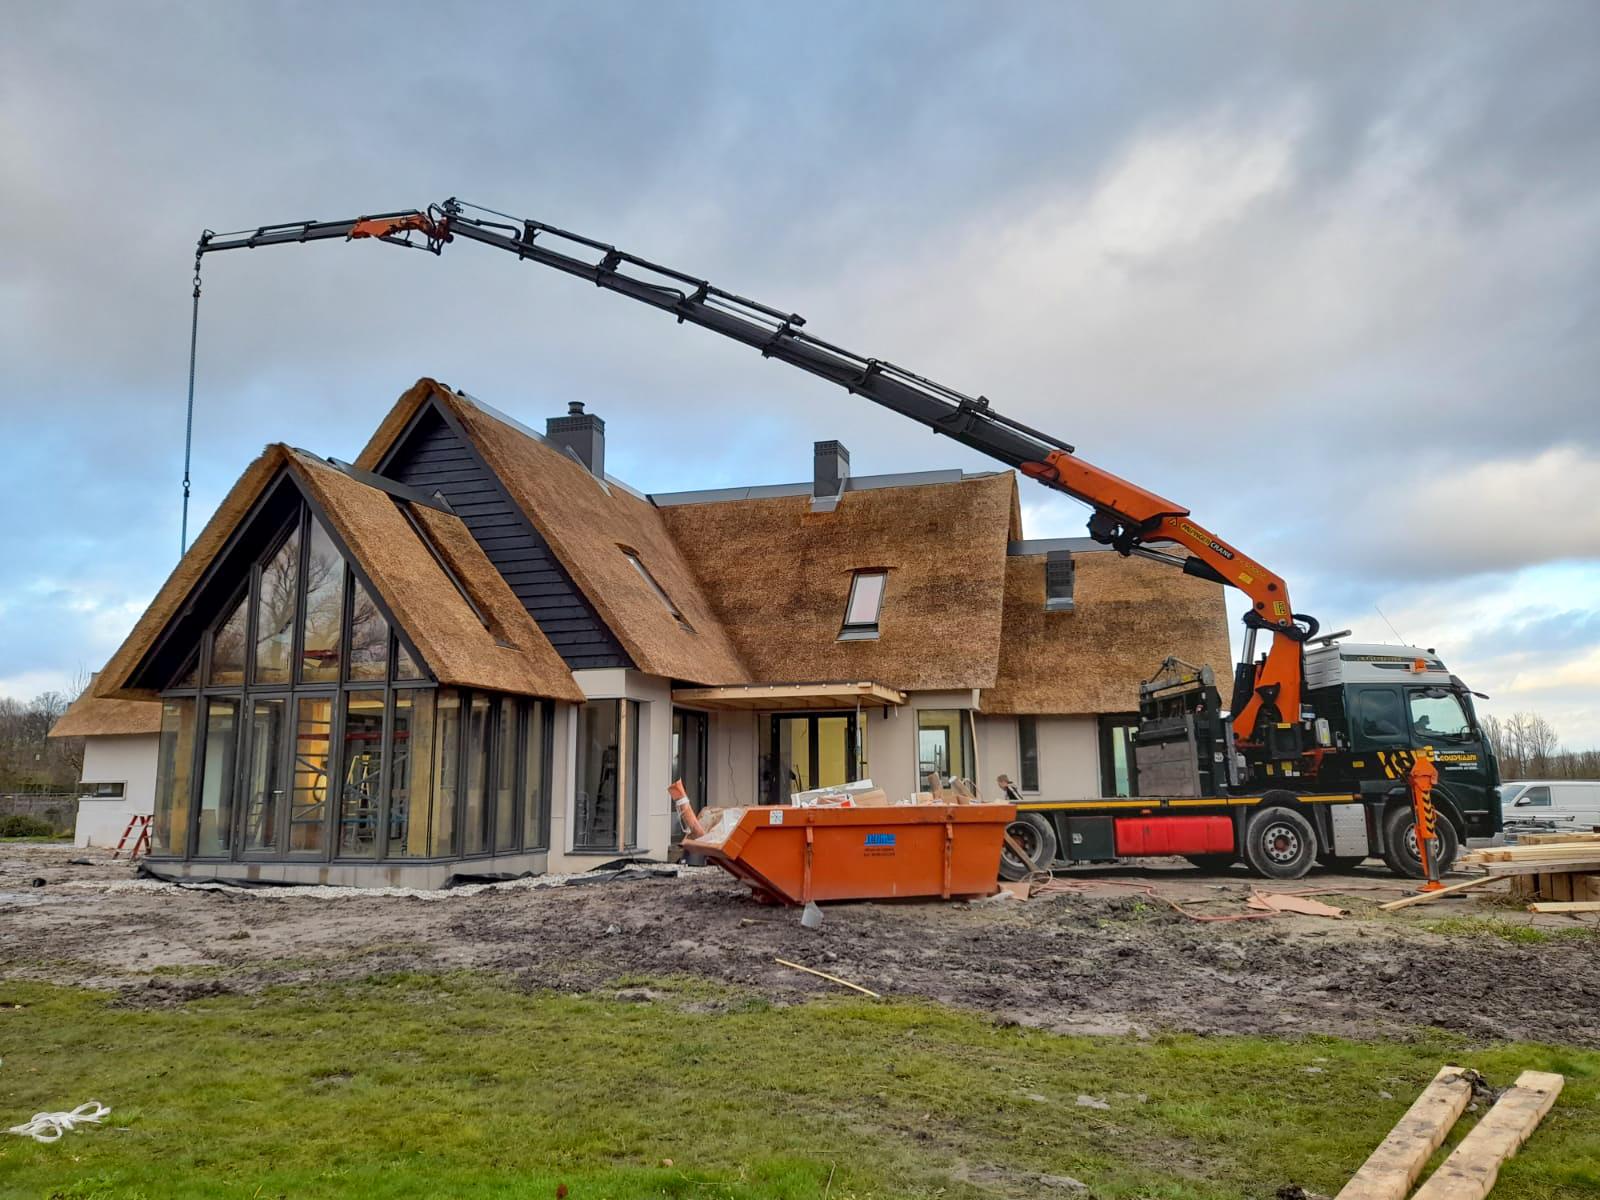 Autolaadkraan Hijswerkzaamheden Nederland JIB